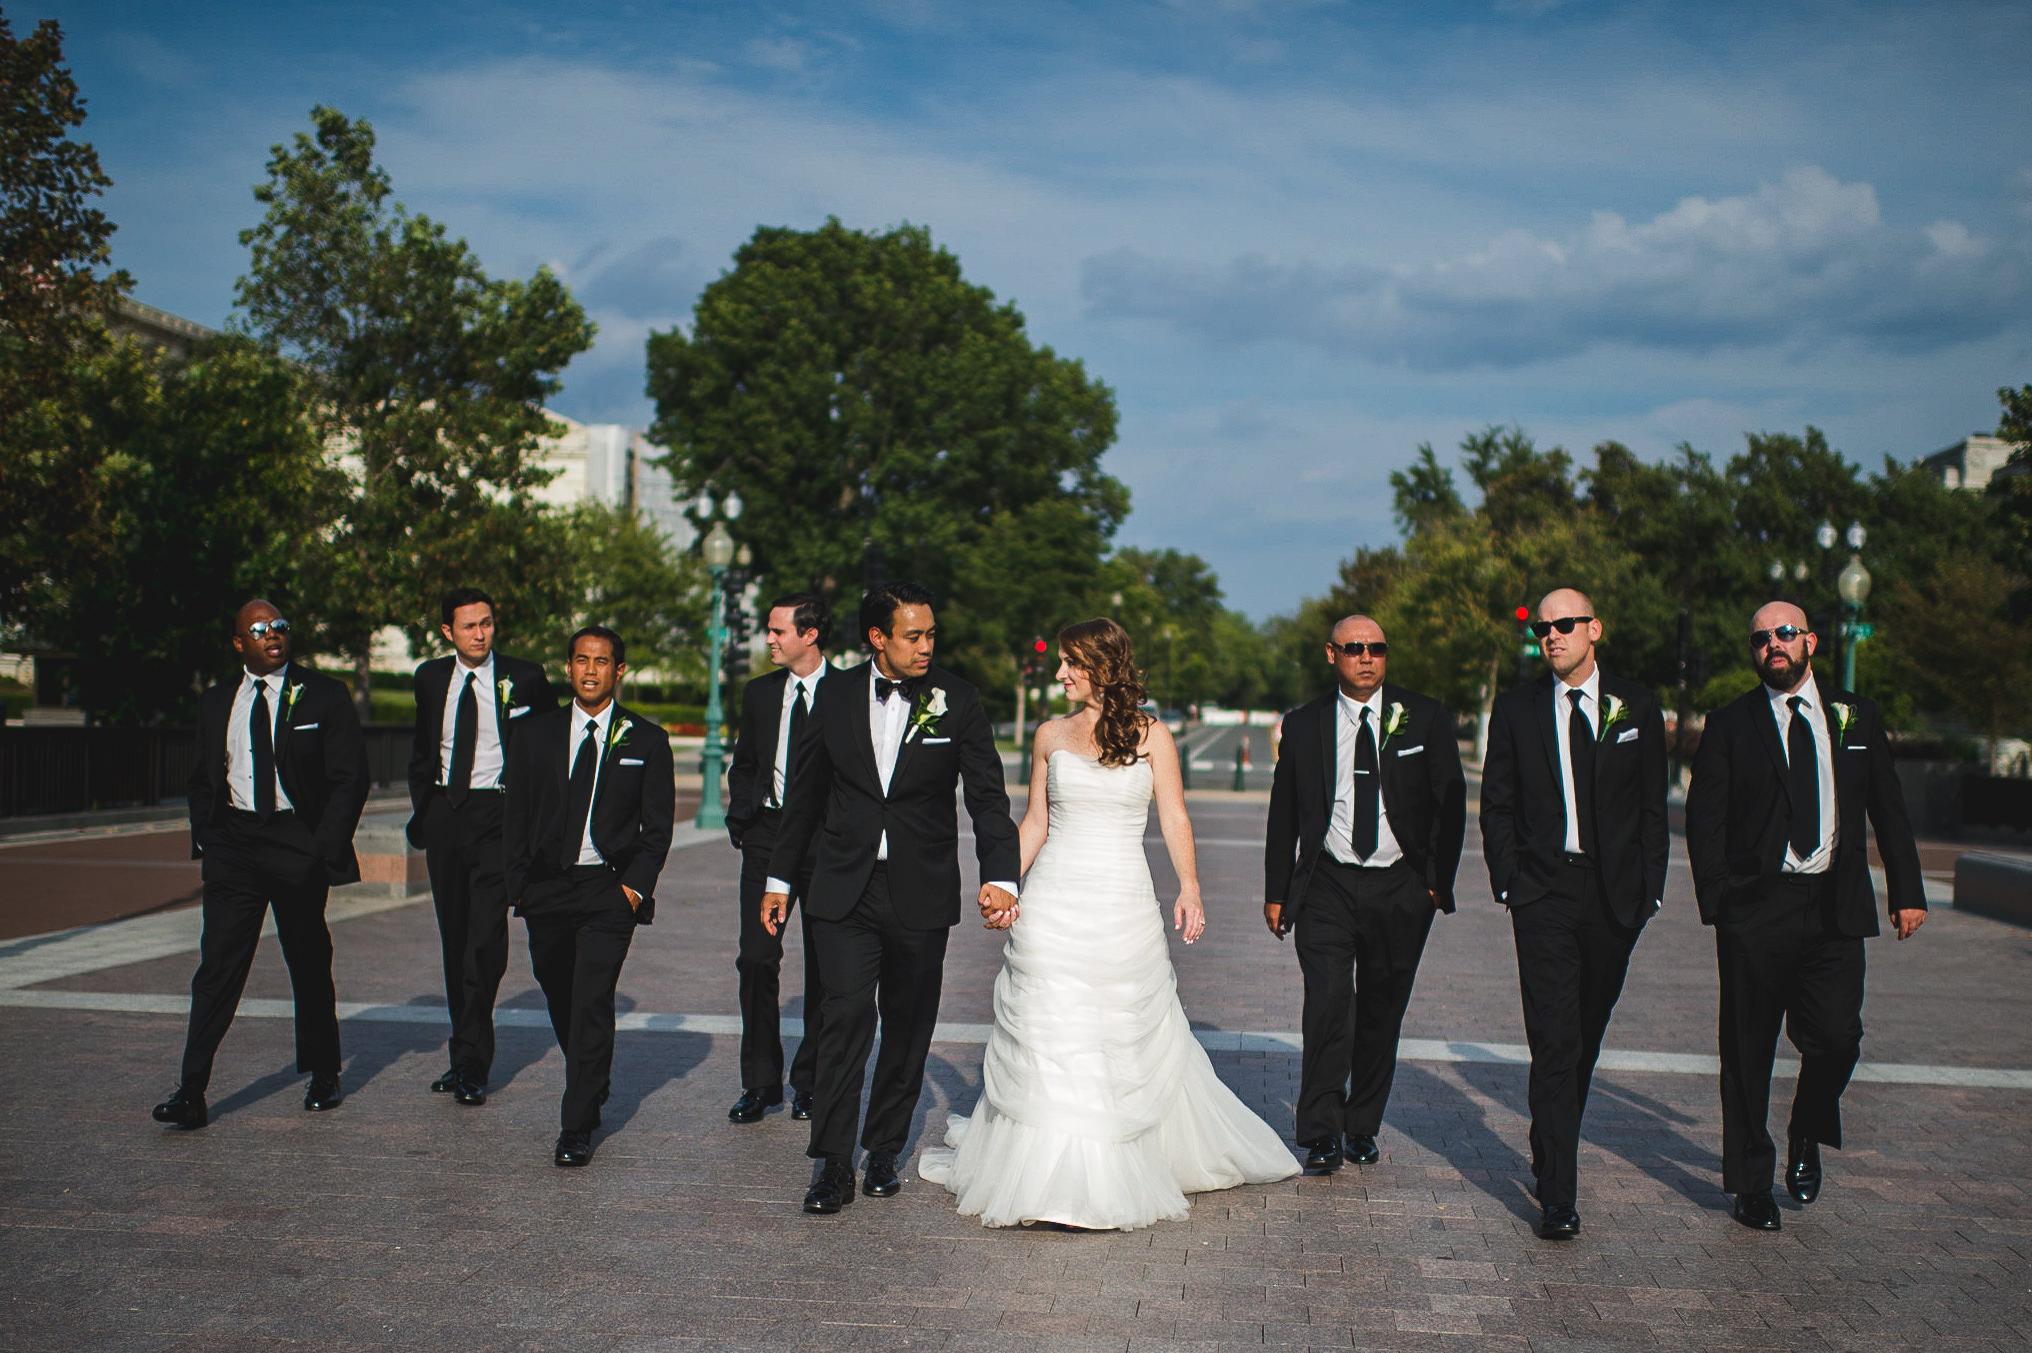 Wedding at W Hotel Washington DC by Mantas Kubilinskas-13.jpg